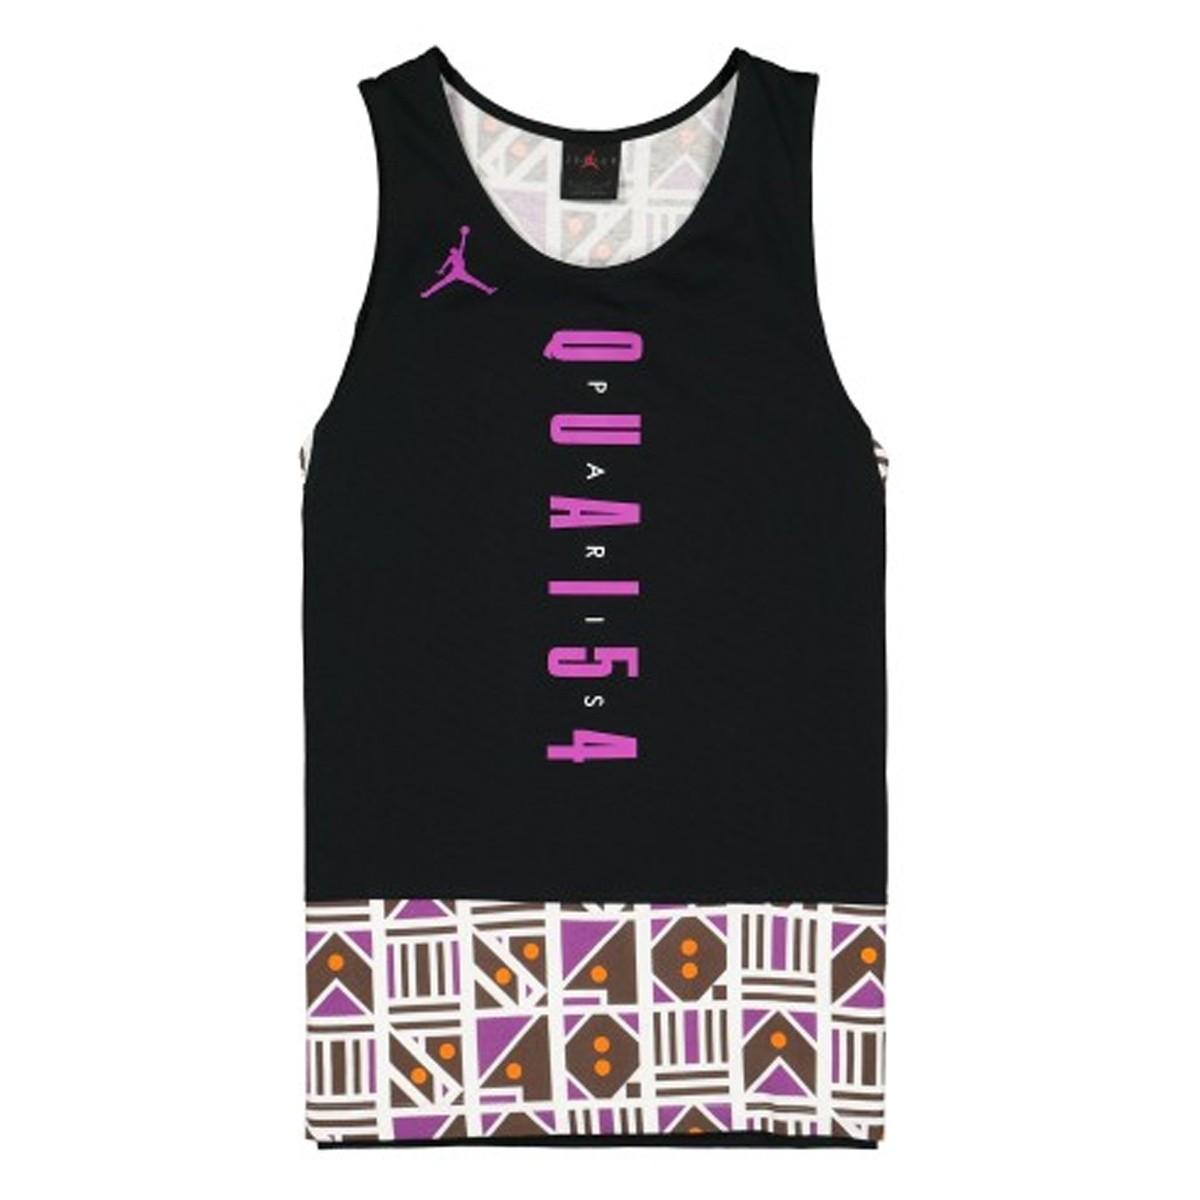 Camiseta Jordan Legacy 'Quai 54'